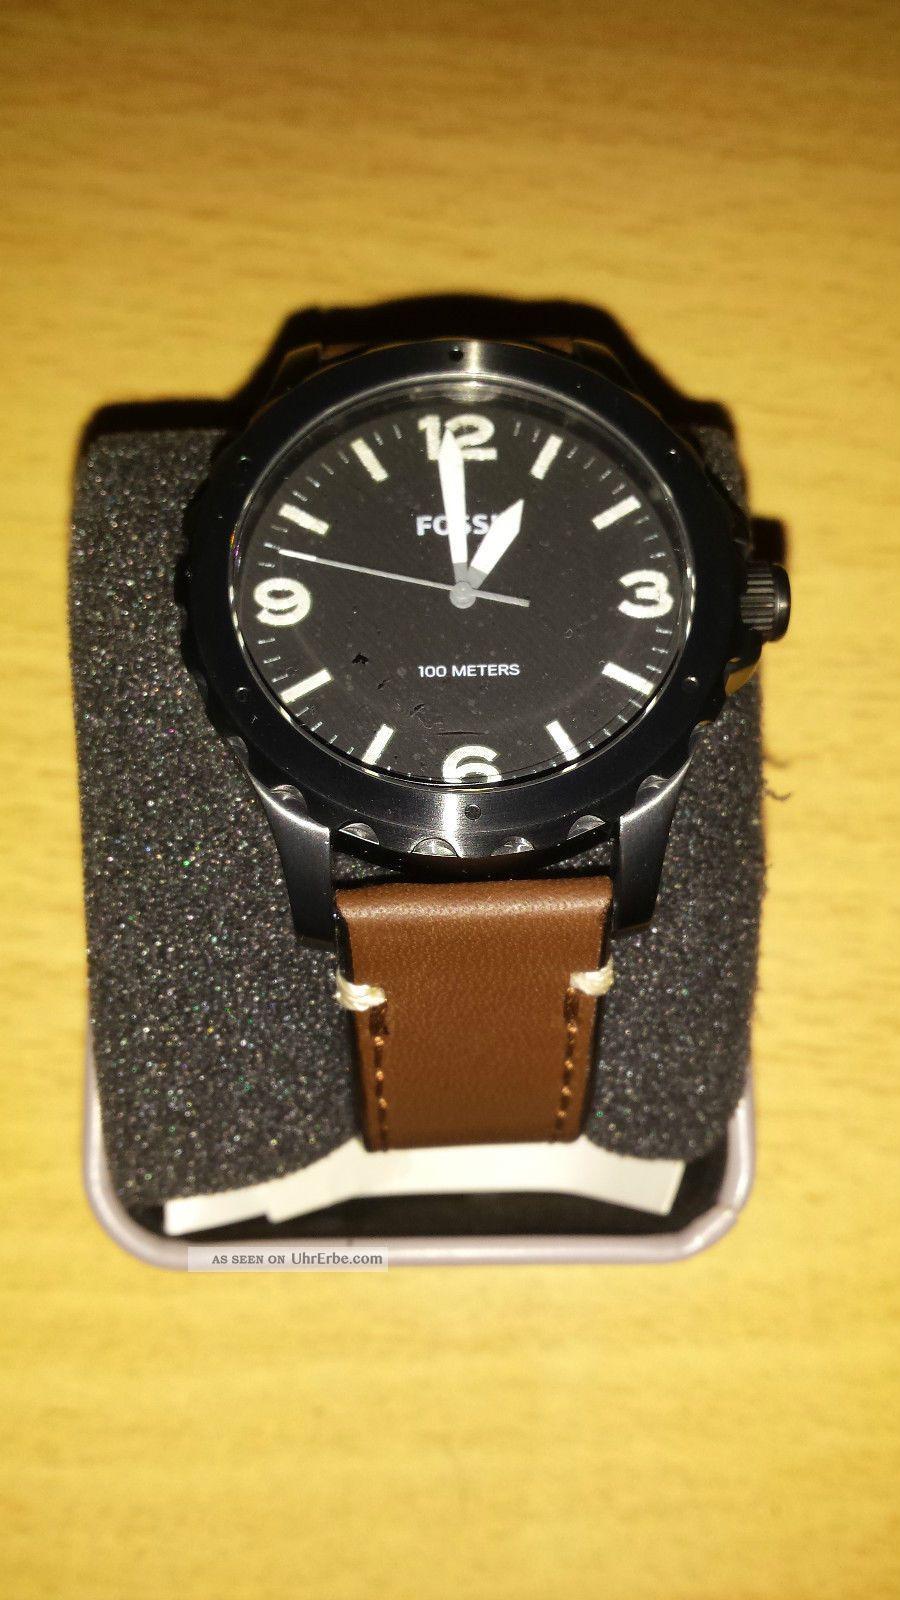 Fossil Herrenarmbanduhr Jr1450 Leder Braun Top Mit Und Etikett Armbanduhren Bild